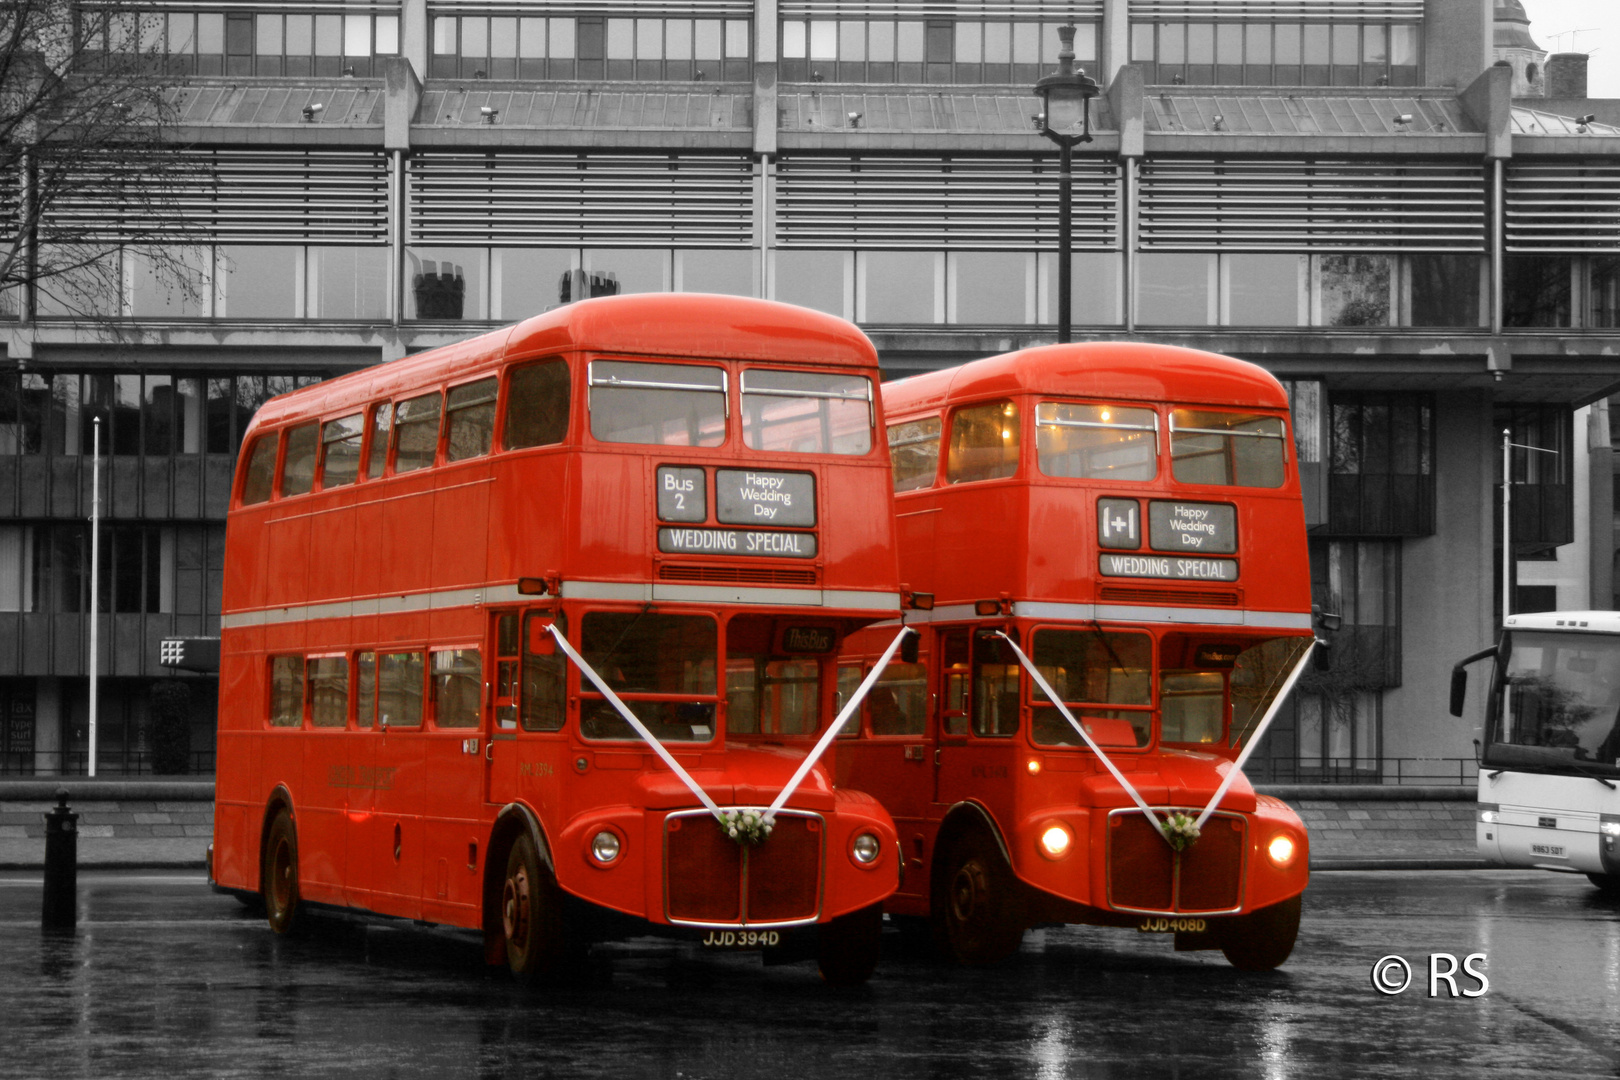 Londonbusses